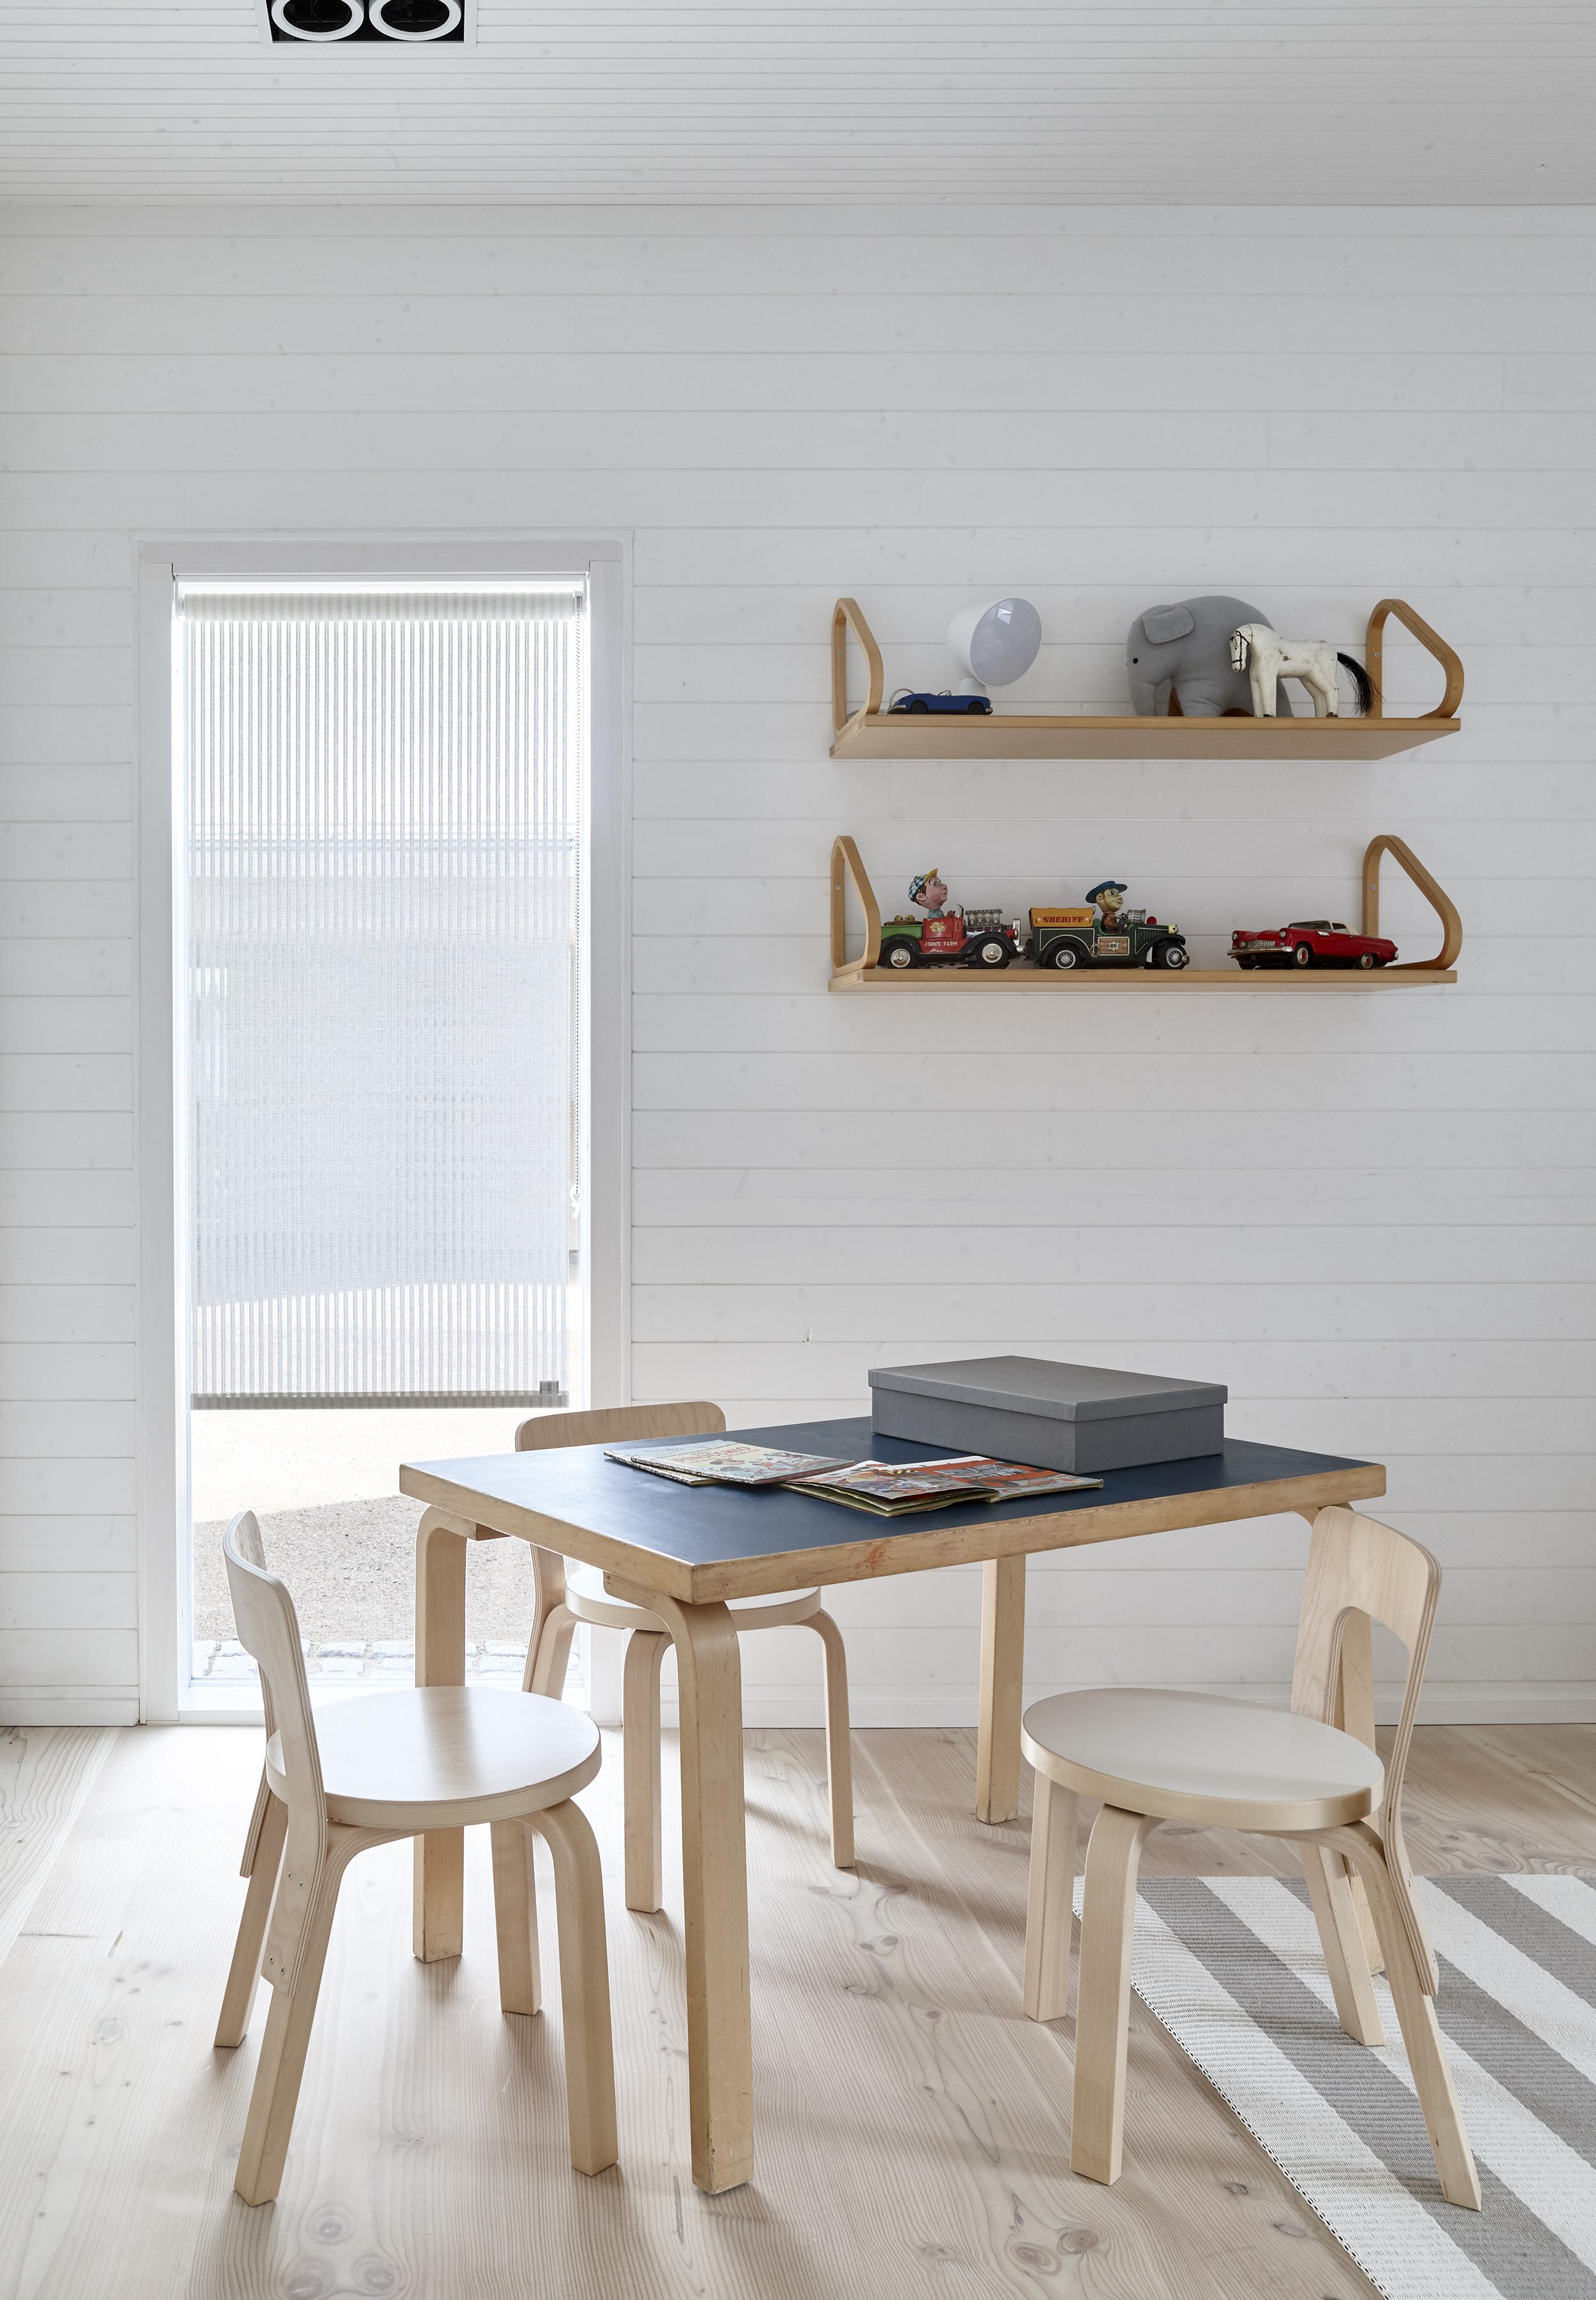 1421501  Big Stripe  stone-white paper yarn carpet,  Vista  21311 white roller blind